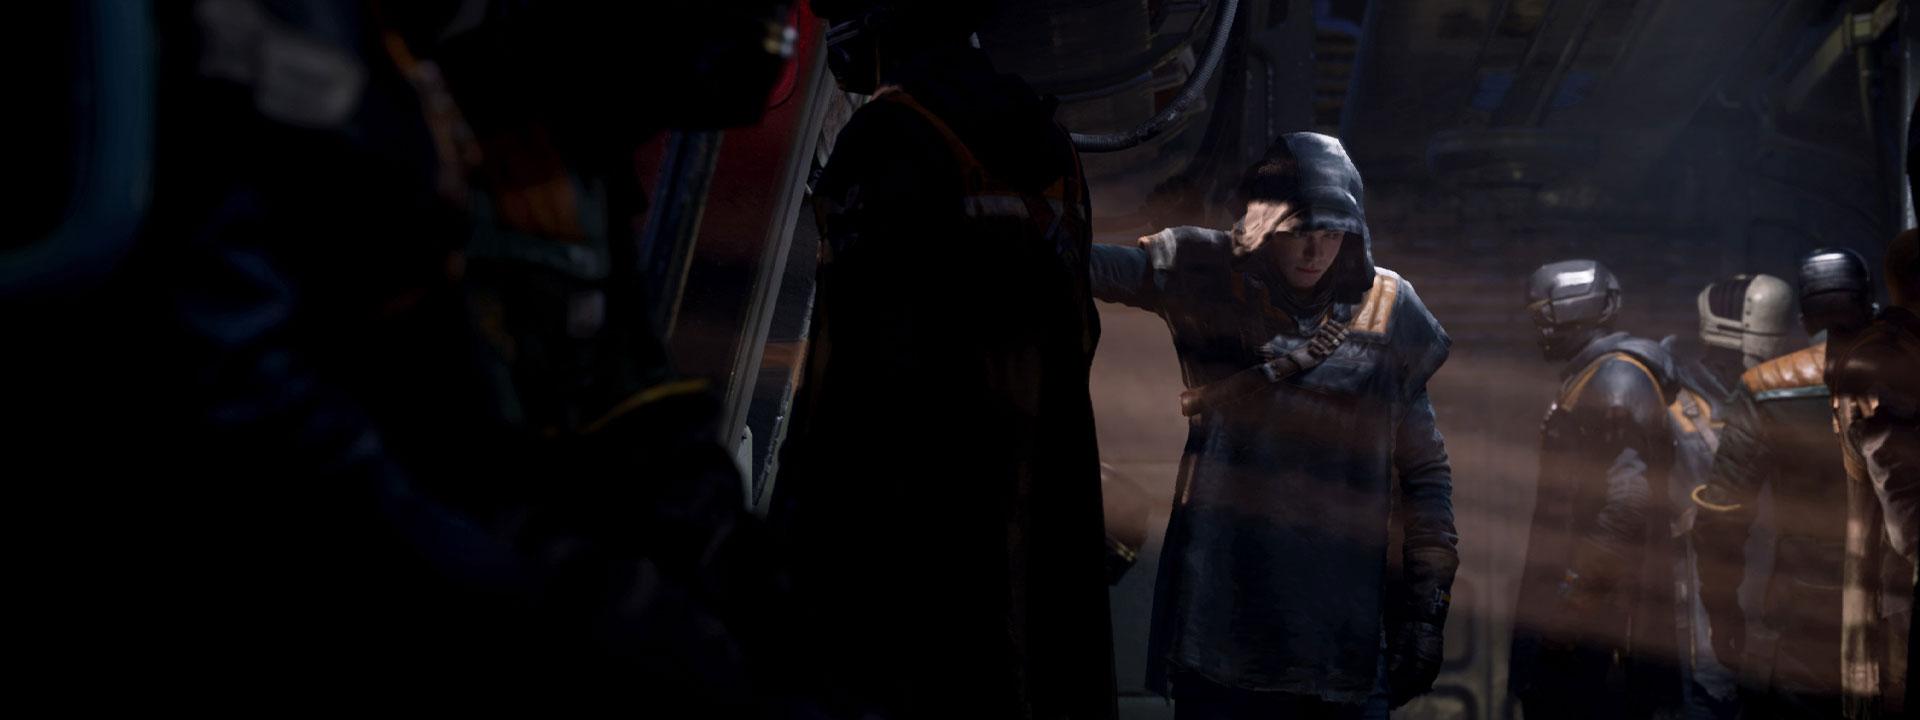 Cal Kestis 将他的脸藏在一辆全是人的车辆引擎盖下